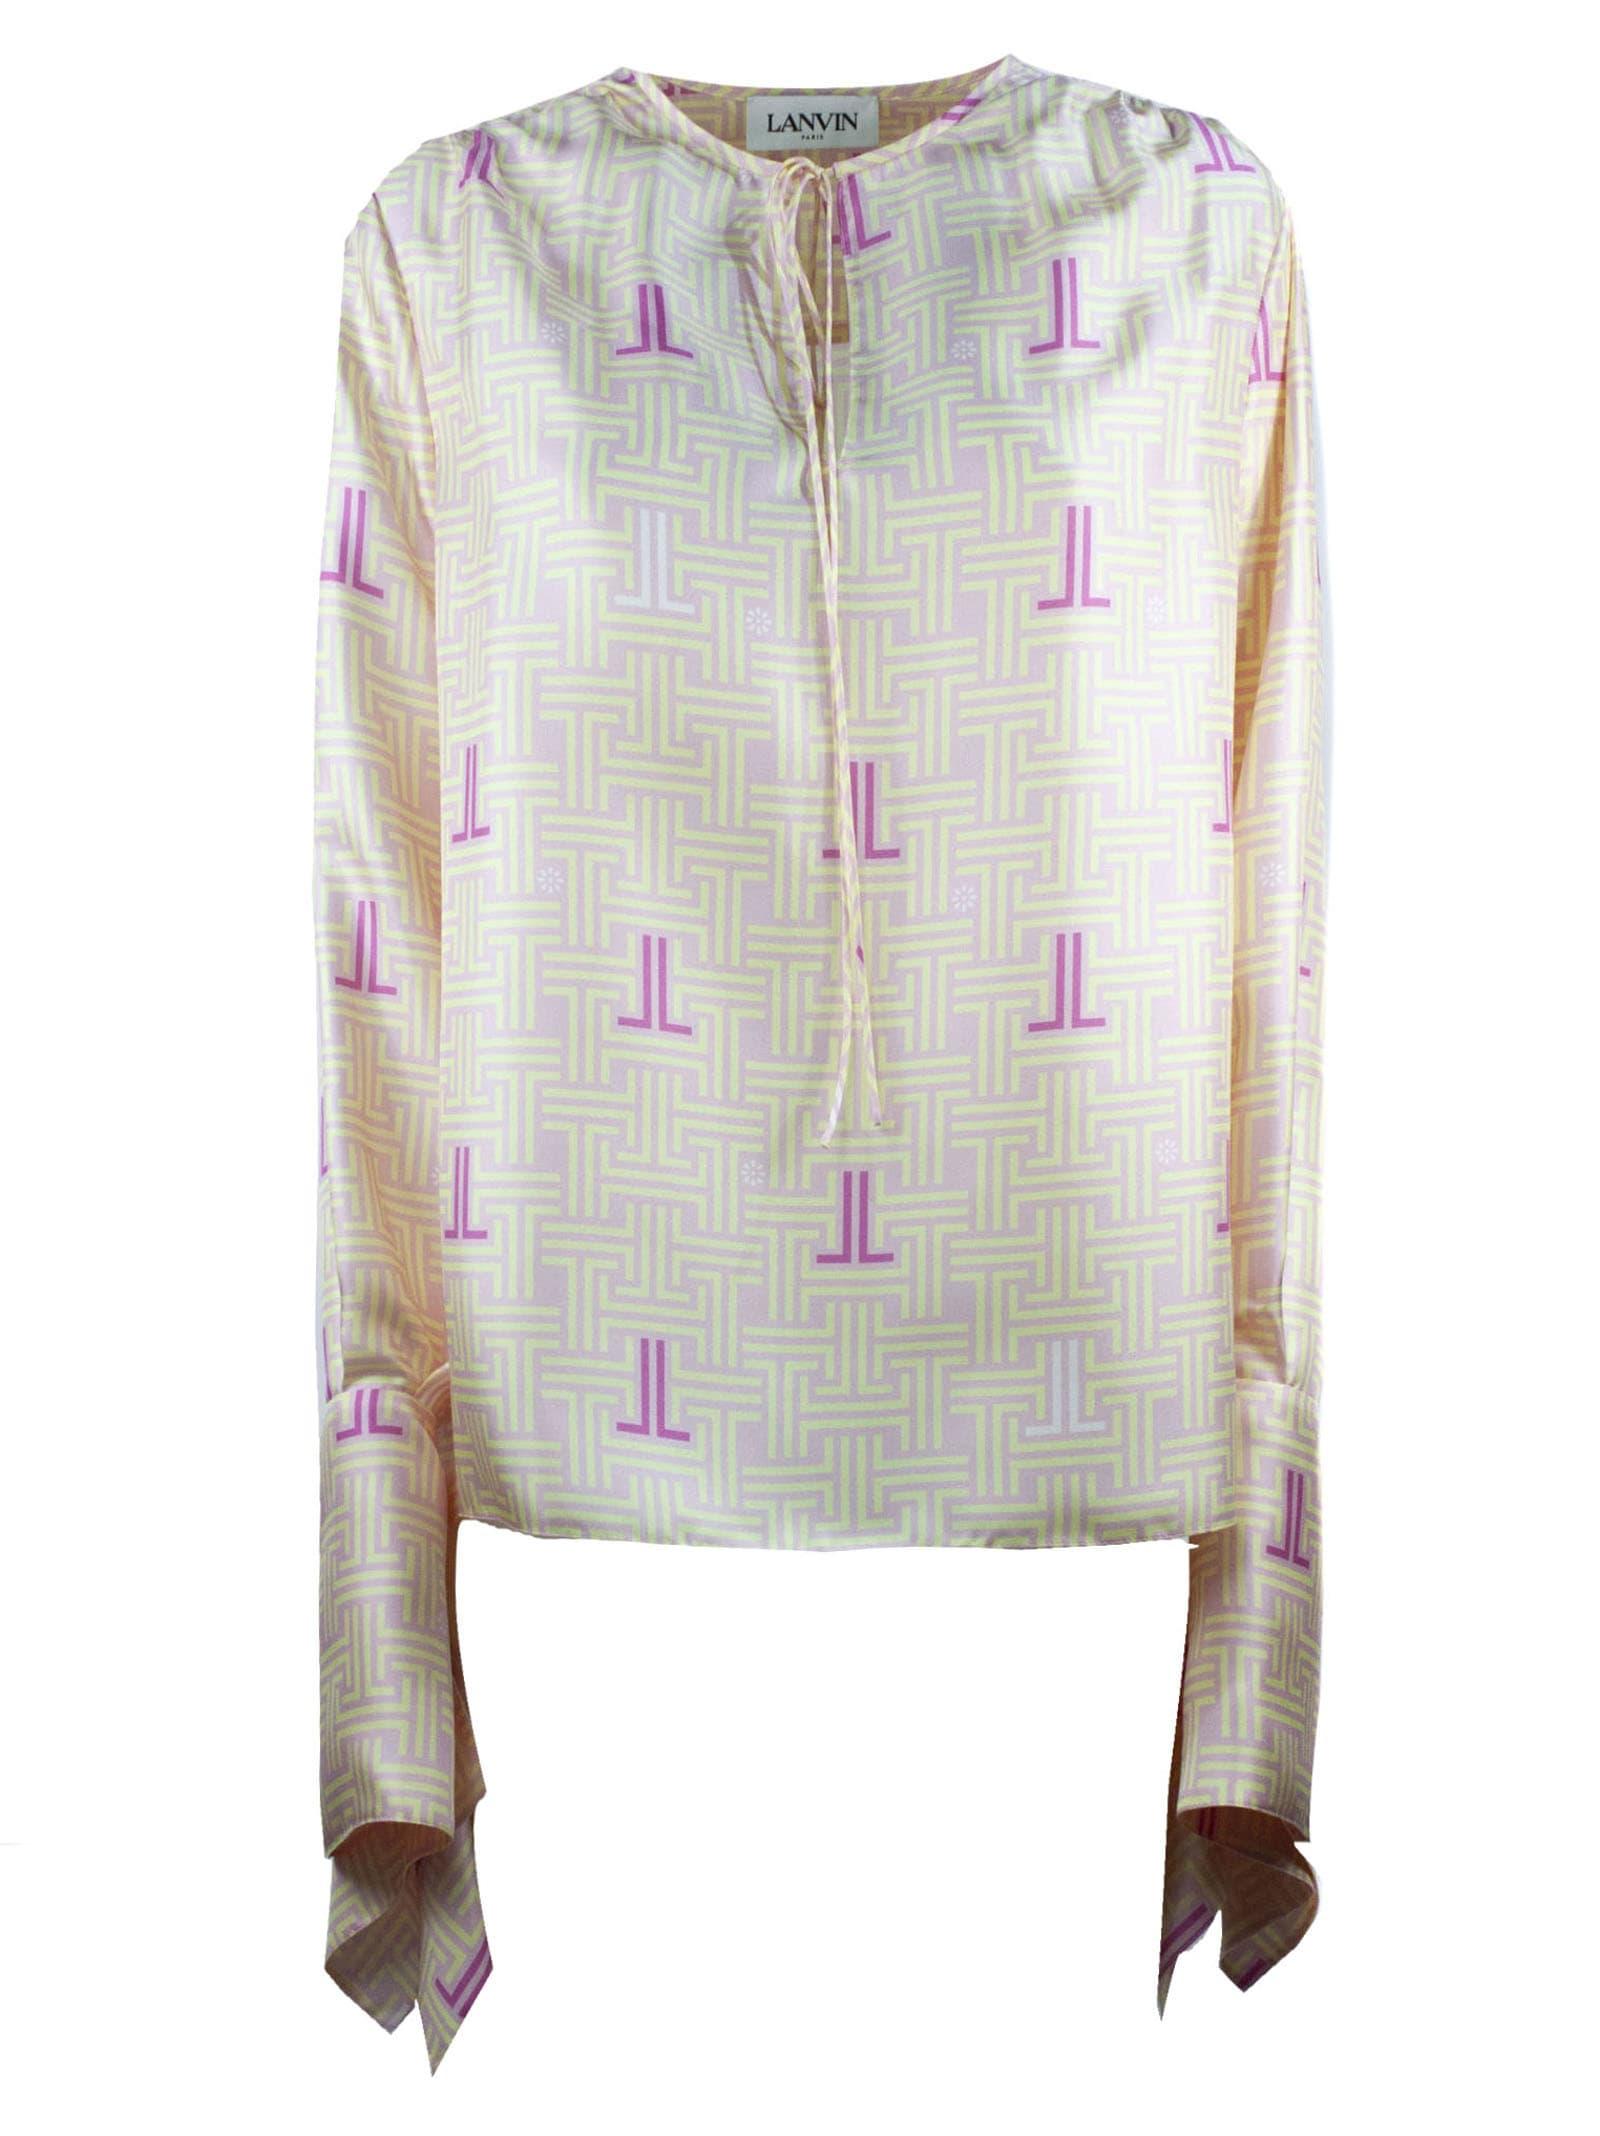 Lanvin Pink Silk Jl Labyrinth Blouse